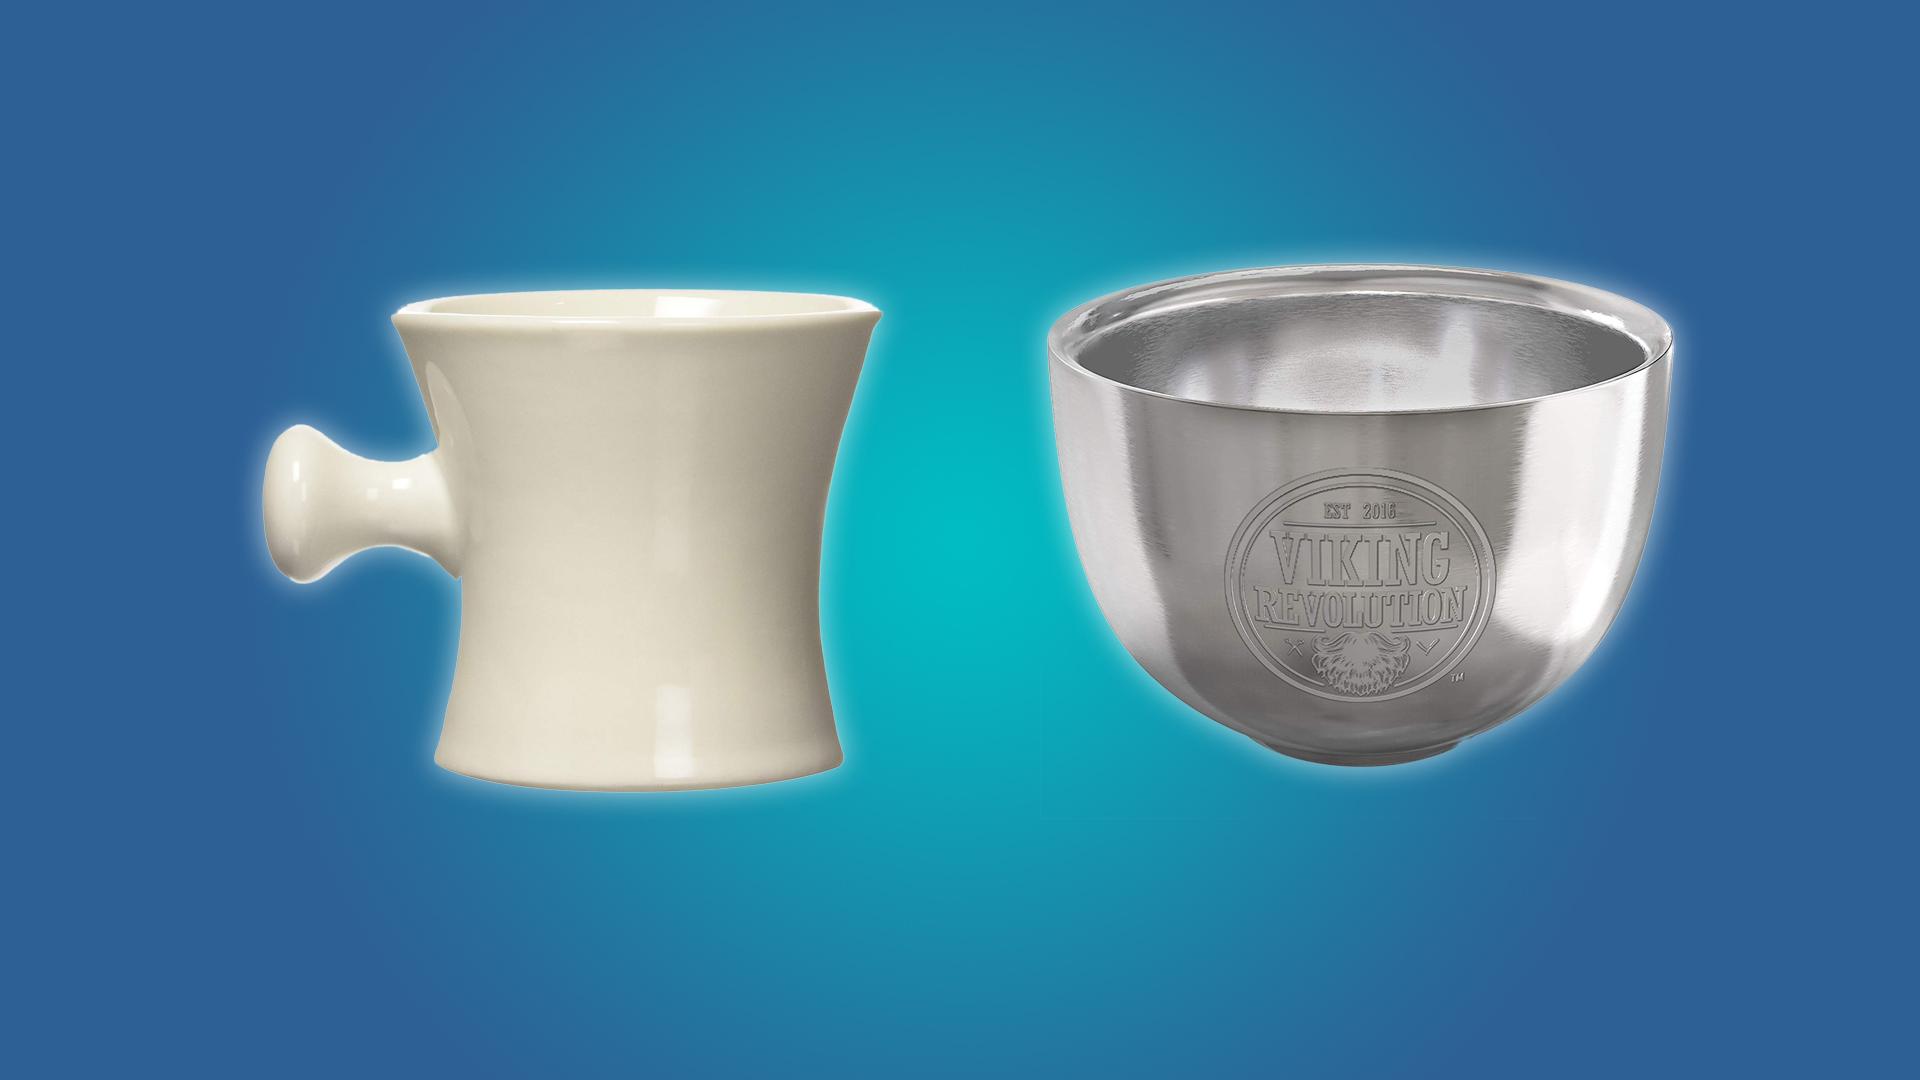 The Harry shaving mug and the Viking Revolution shaving bowl